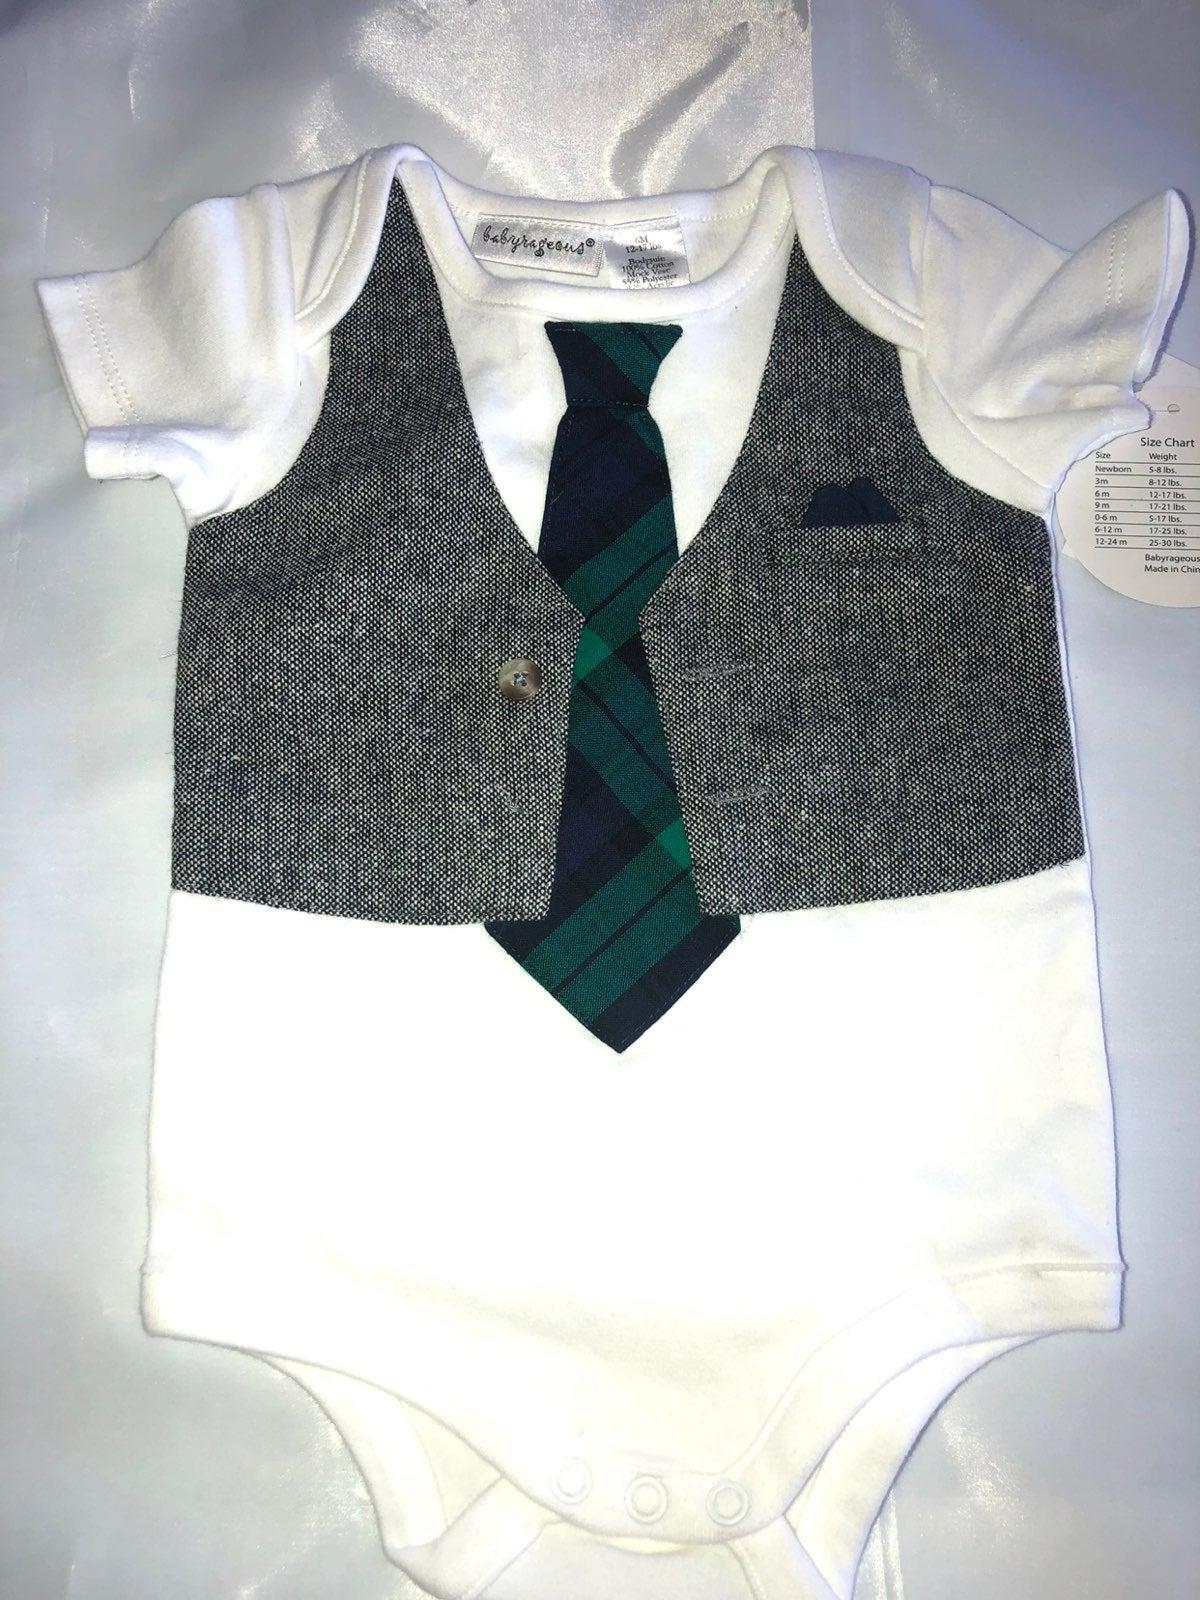 Baby Onesie With Tie And Vest